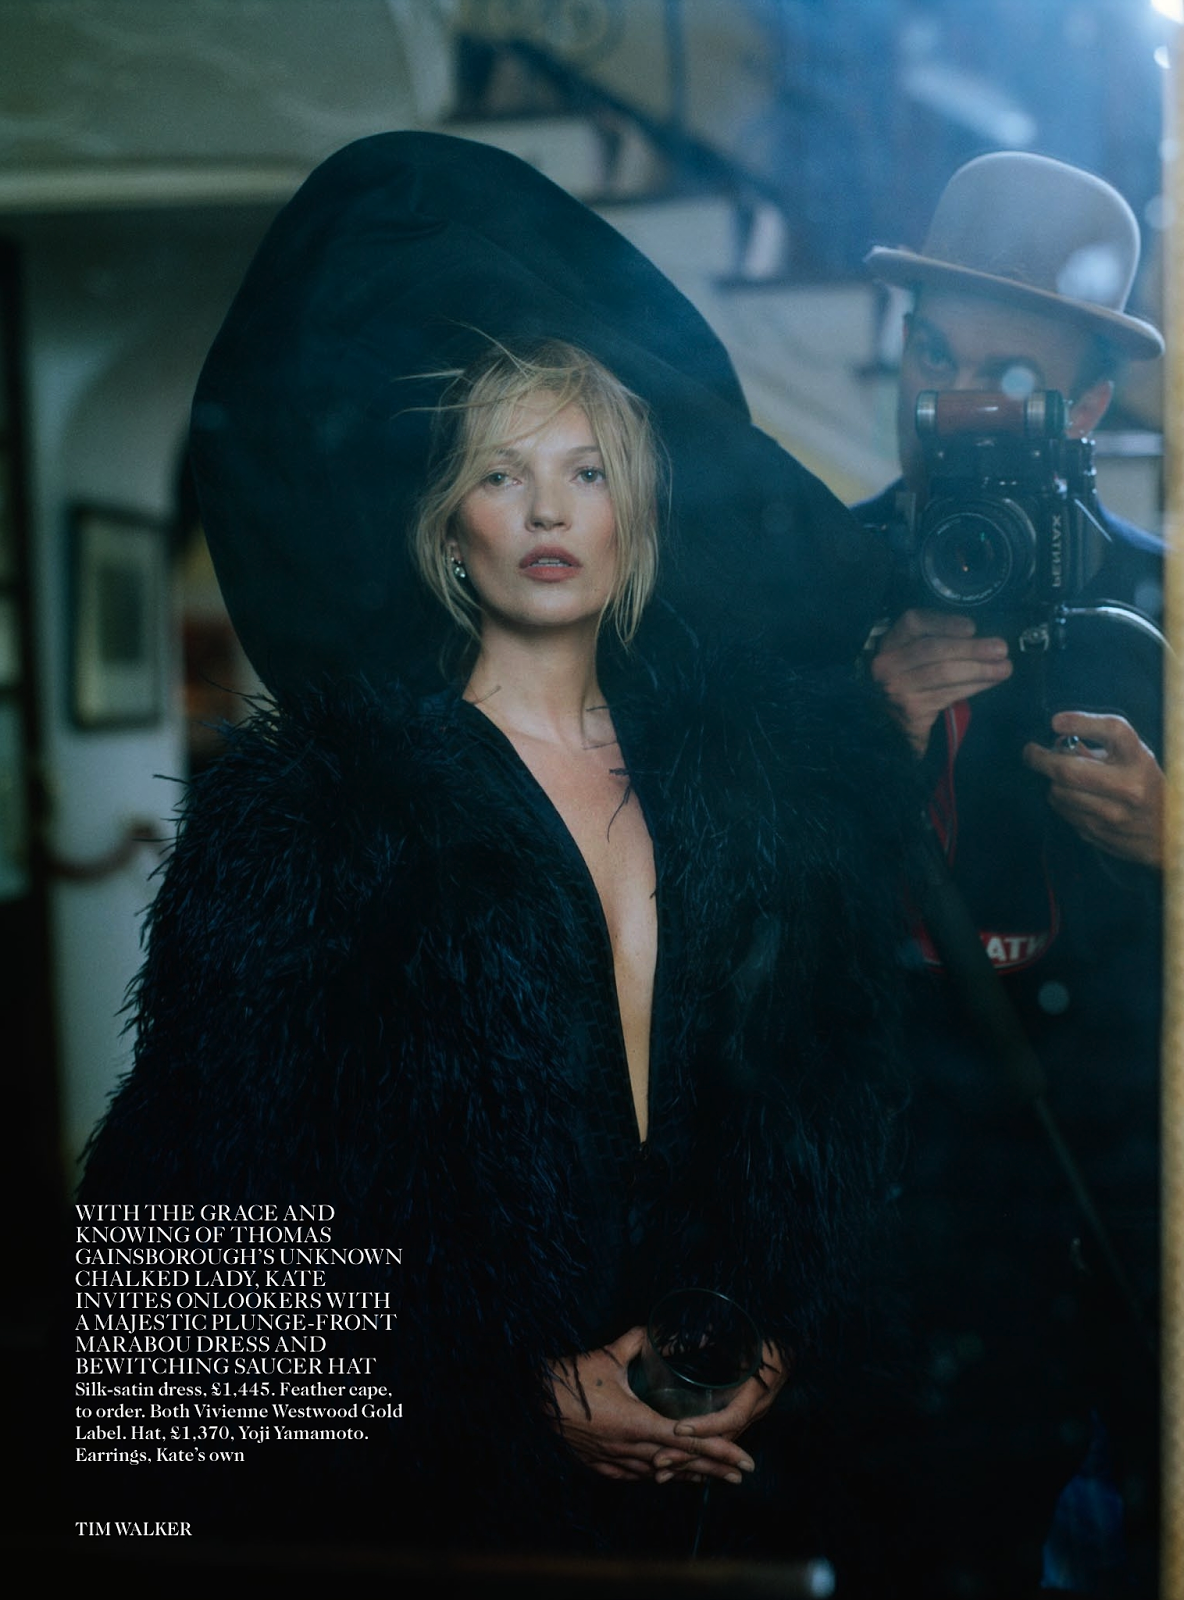 #KateMoss by #TimWalker for #VogueUK December 2013